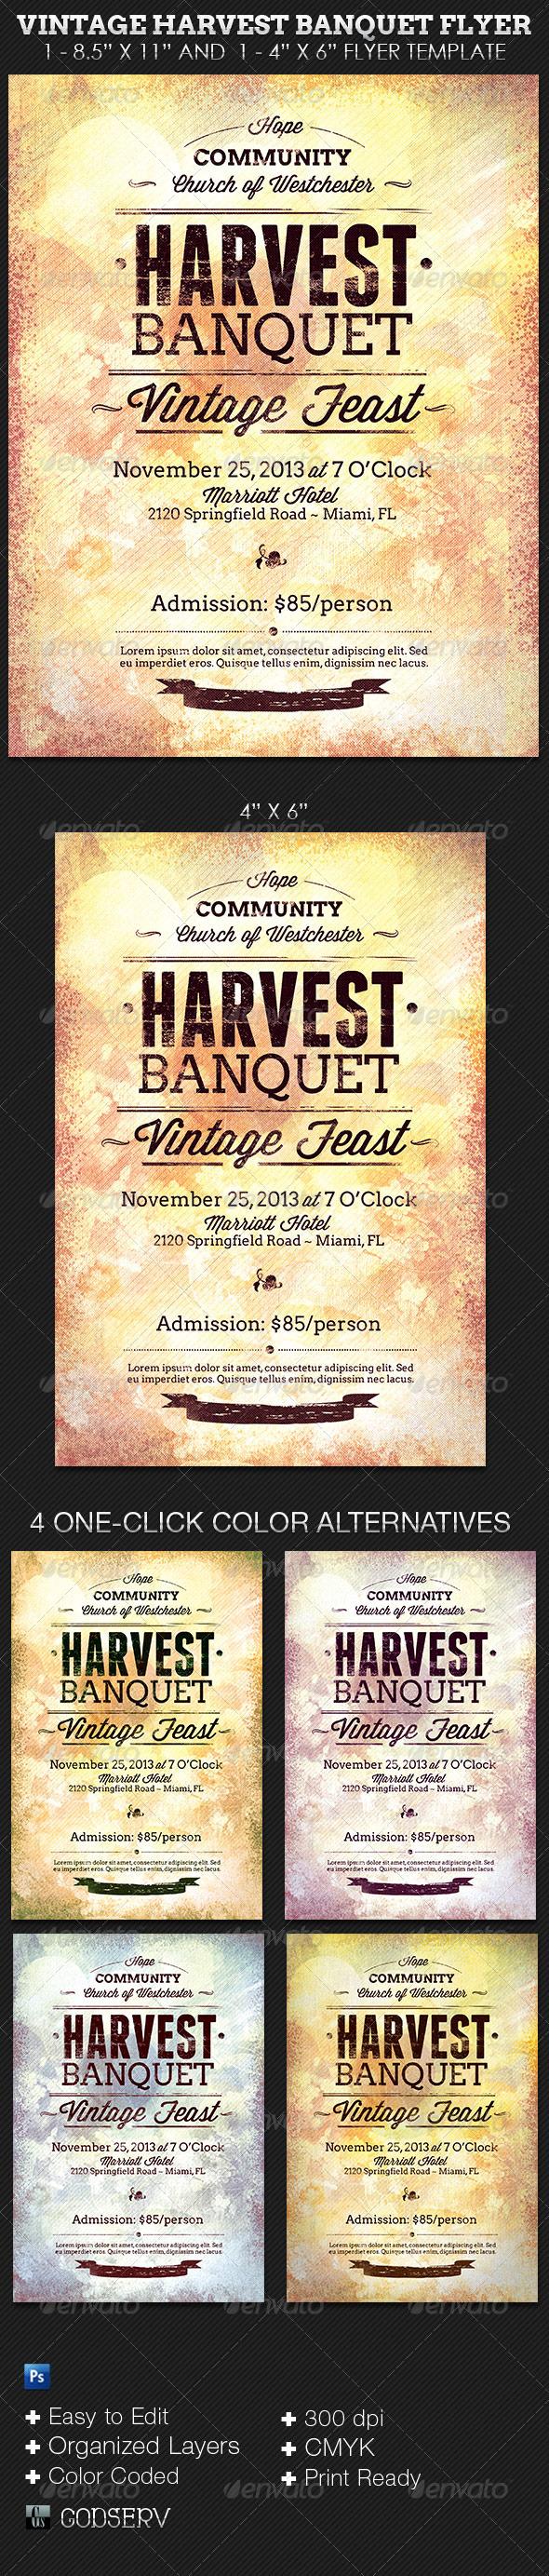 Vintage Harvest Banquet Flyer Template - Church Flyers